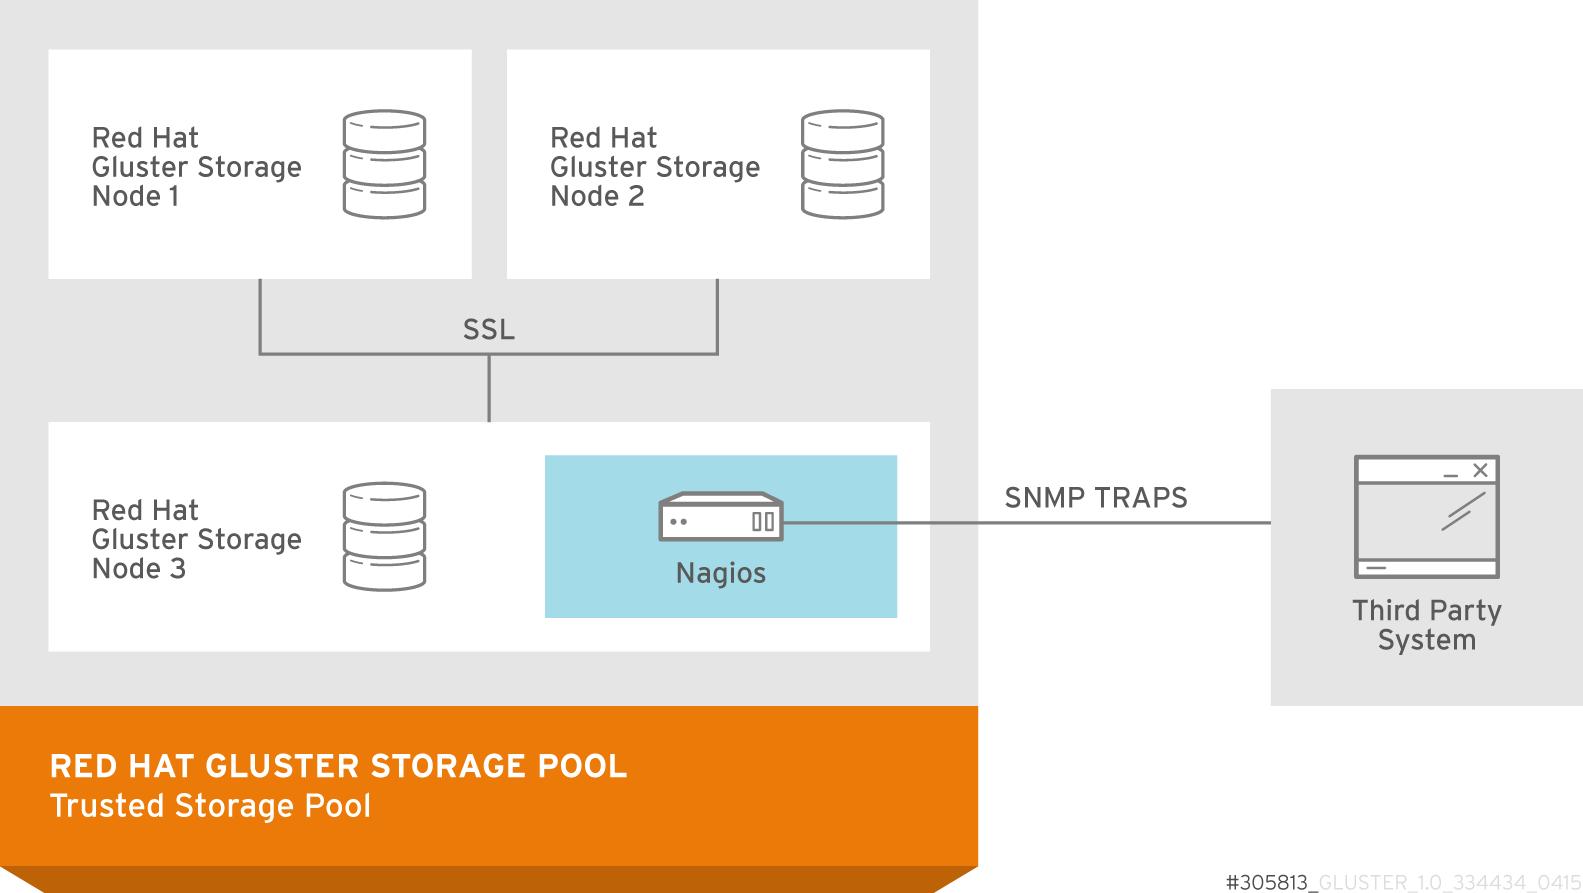 Nagios deployed on Red Hat Gluster Storage node